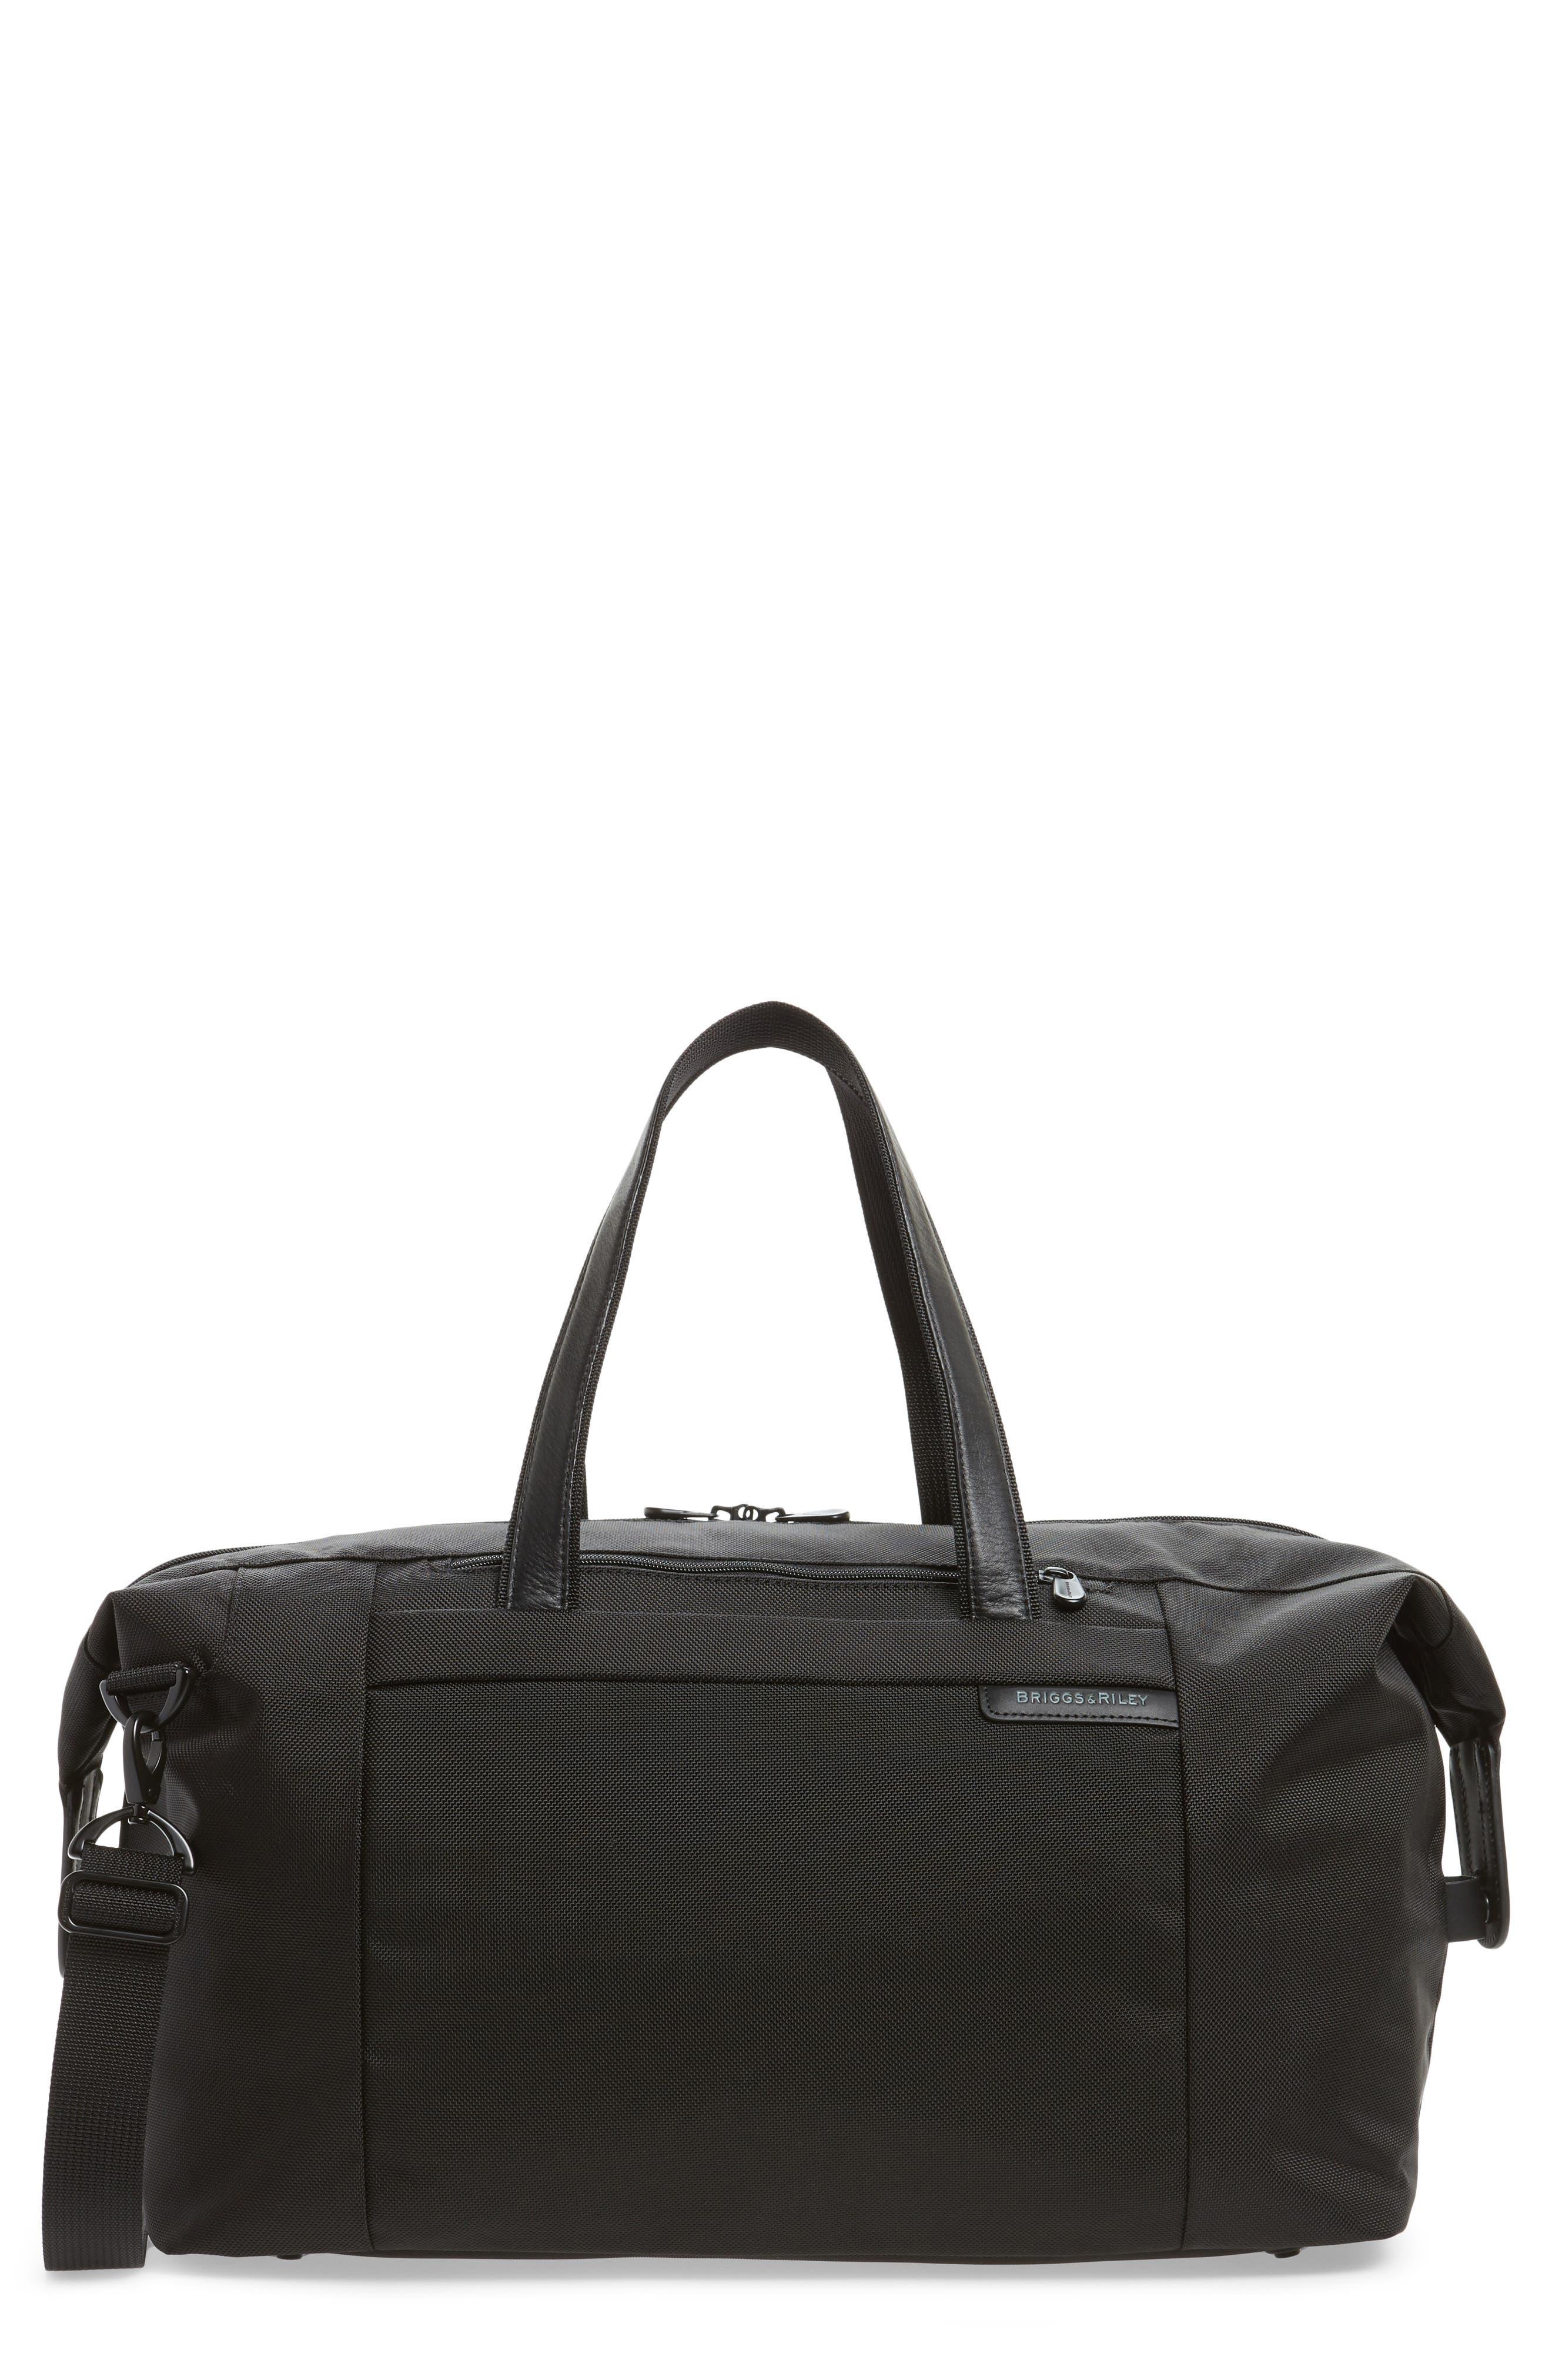 BRIGGS & RILEY 'Baseline' Duffel Bag, Main, color, BLACK